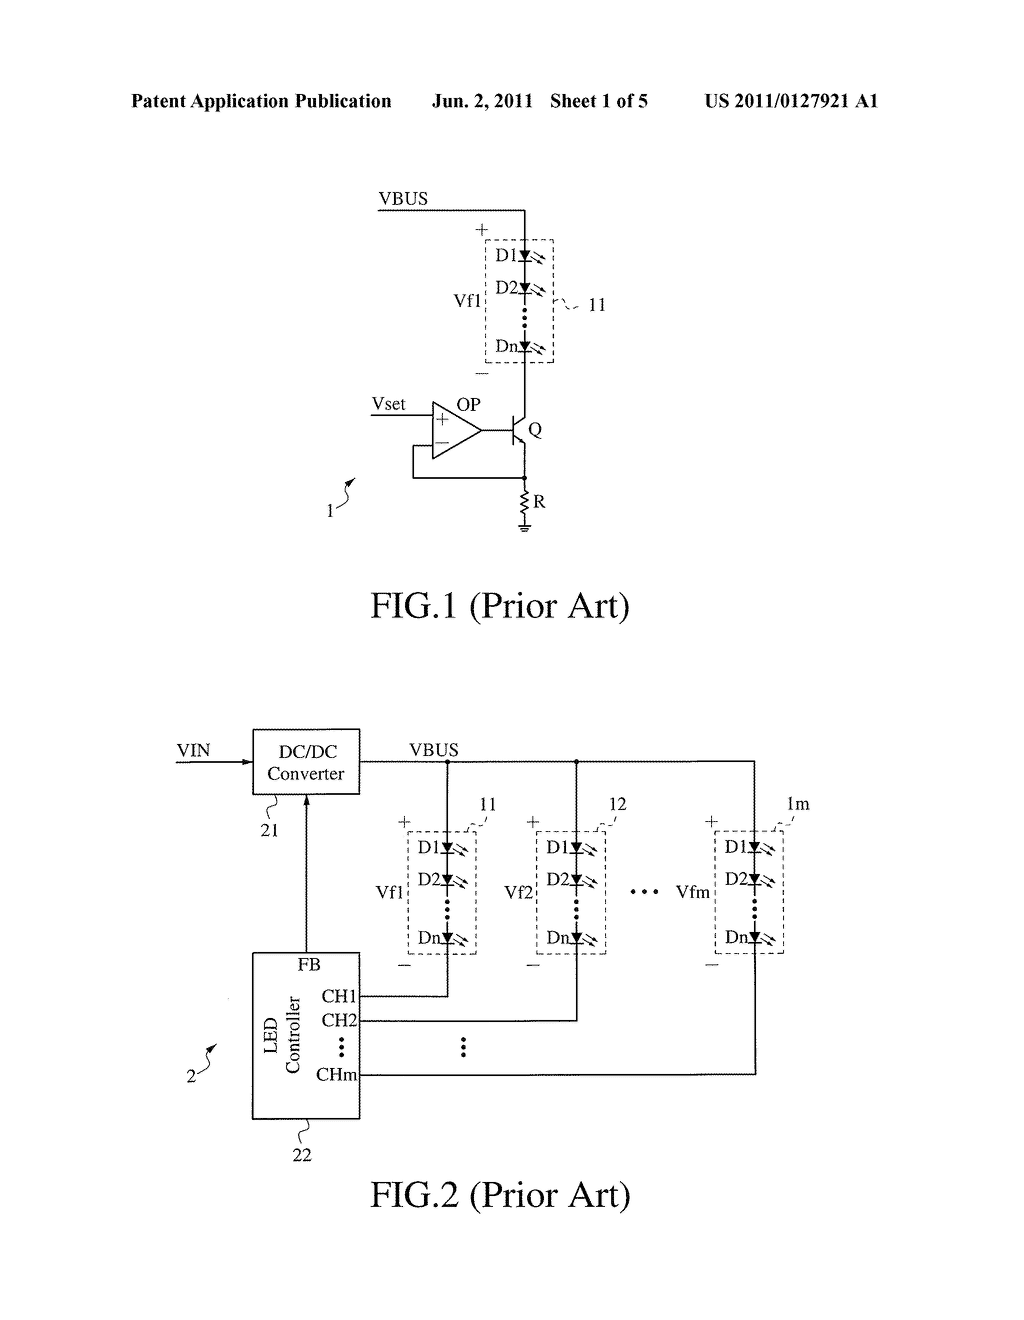 Current Balance Circuit Diagram House Wiring Symbols 12 Parallel Ac Circuits Light Emitting Diode Led Rh Patentsencyclopedia Com